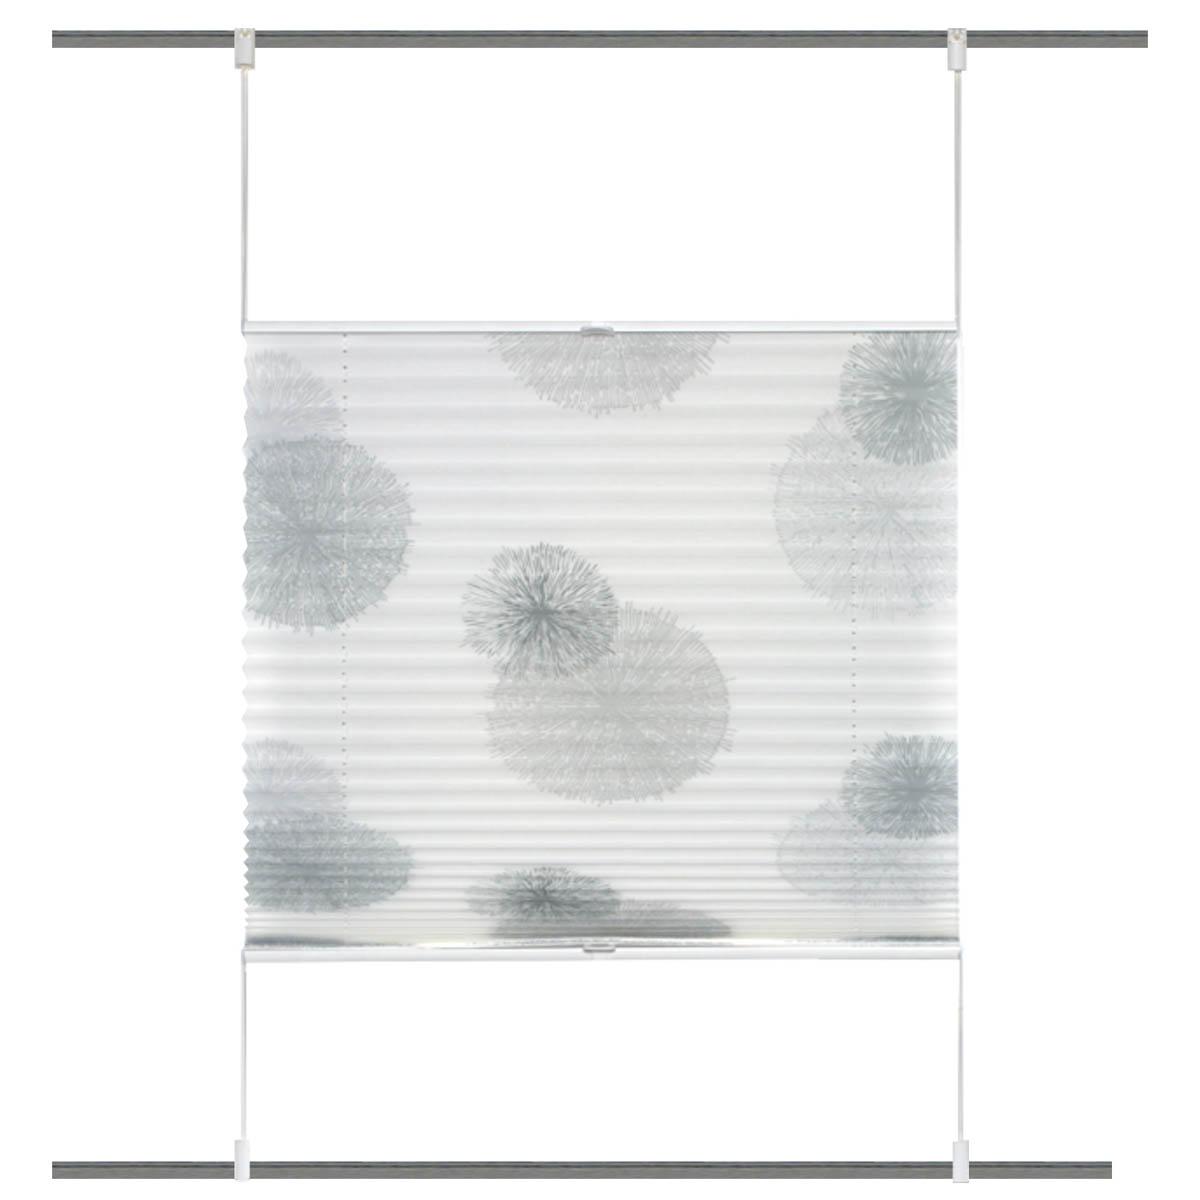 Plisseerollo Rawlins digital bedruckt mit Up & Down Technik weiß grau 50x130cm